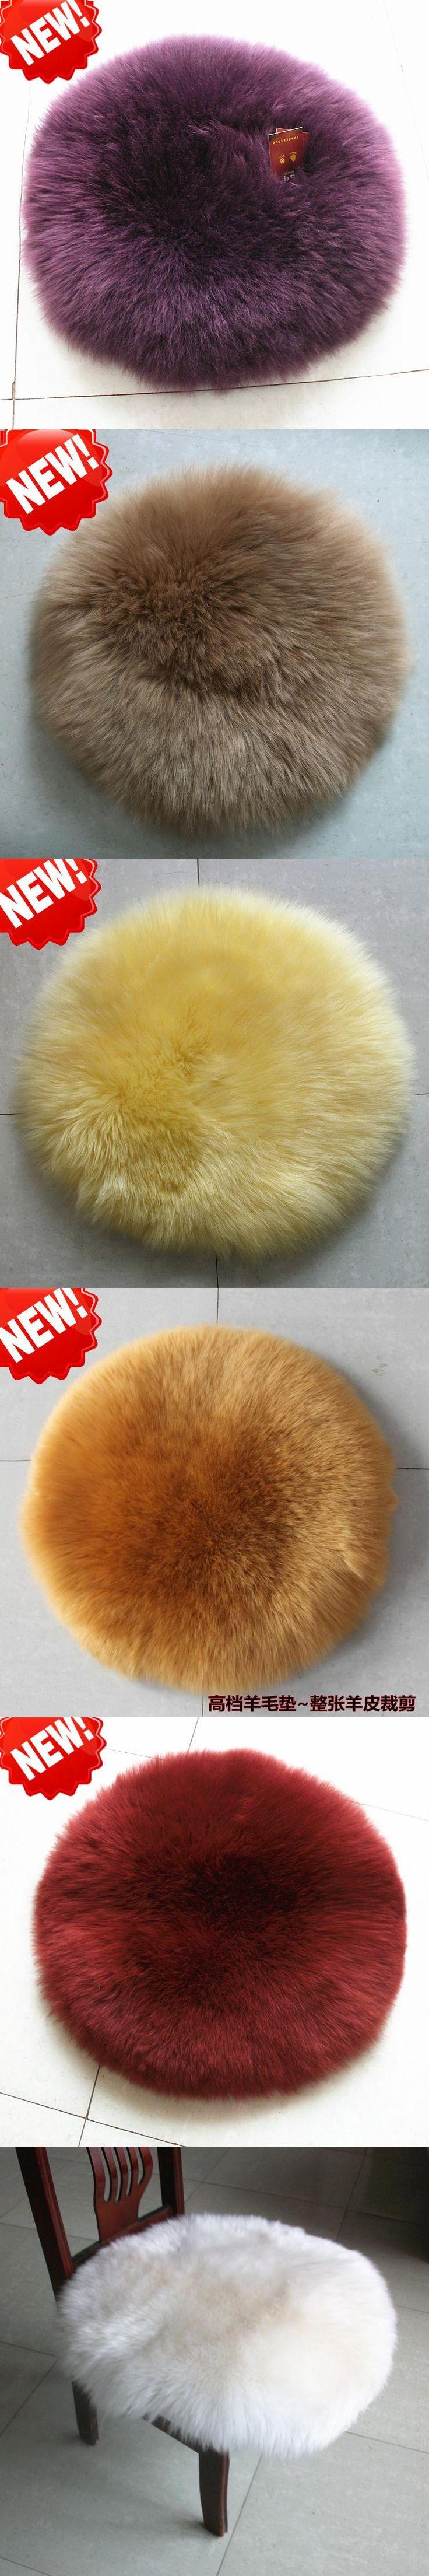 Round Shape Luxurious Sheepskin Wool Car Seat Cushion Fur  Chair Pad With Multi Colors